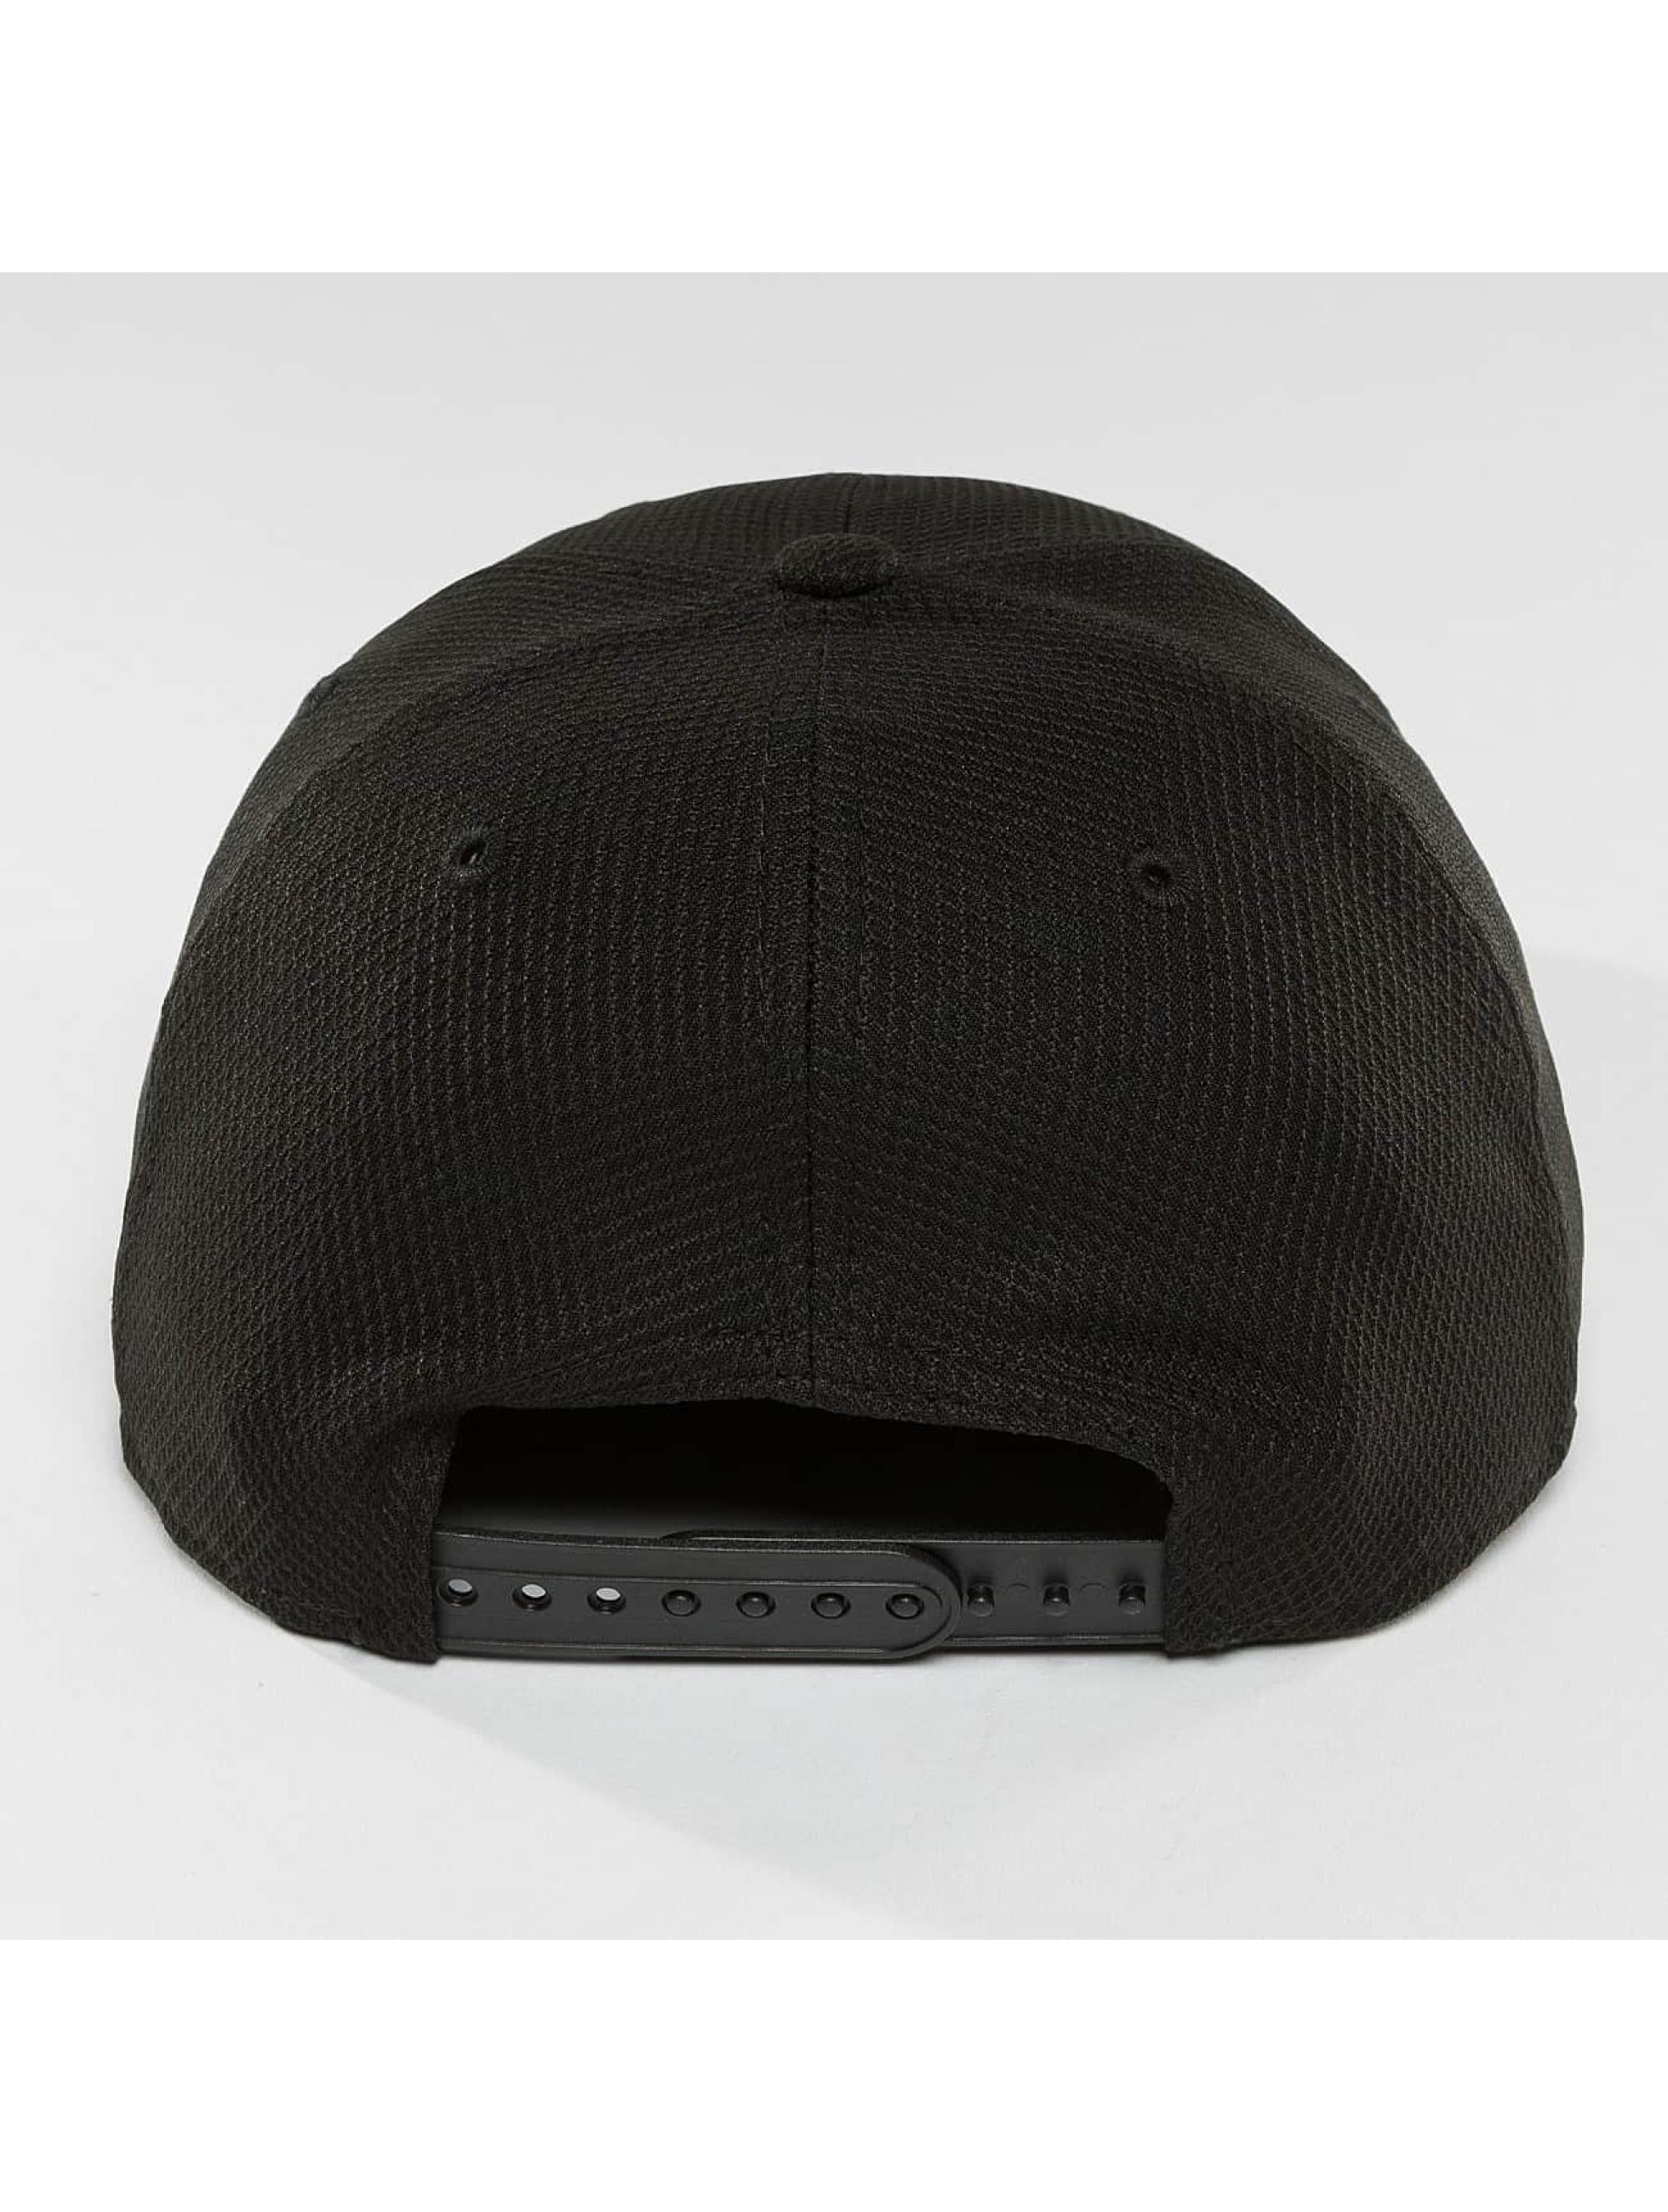 New Era Snapback Cap Blacked Out black